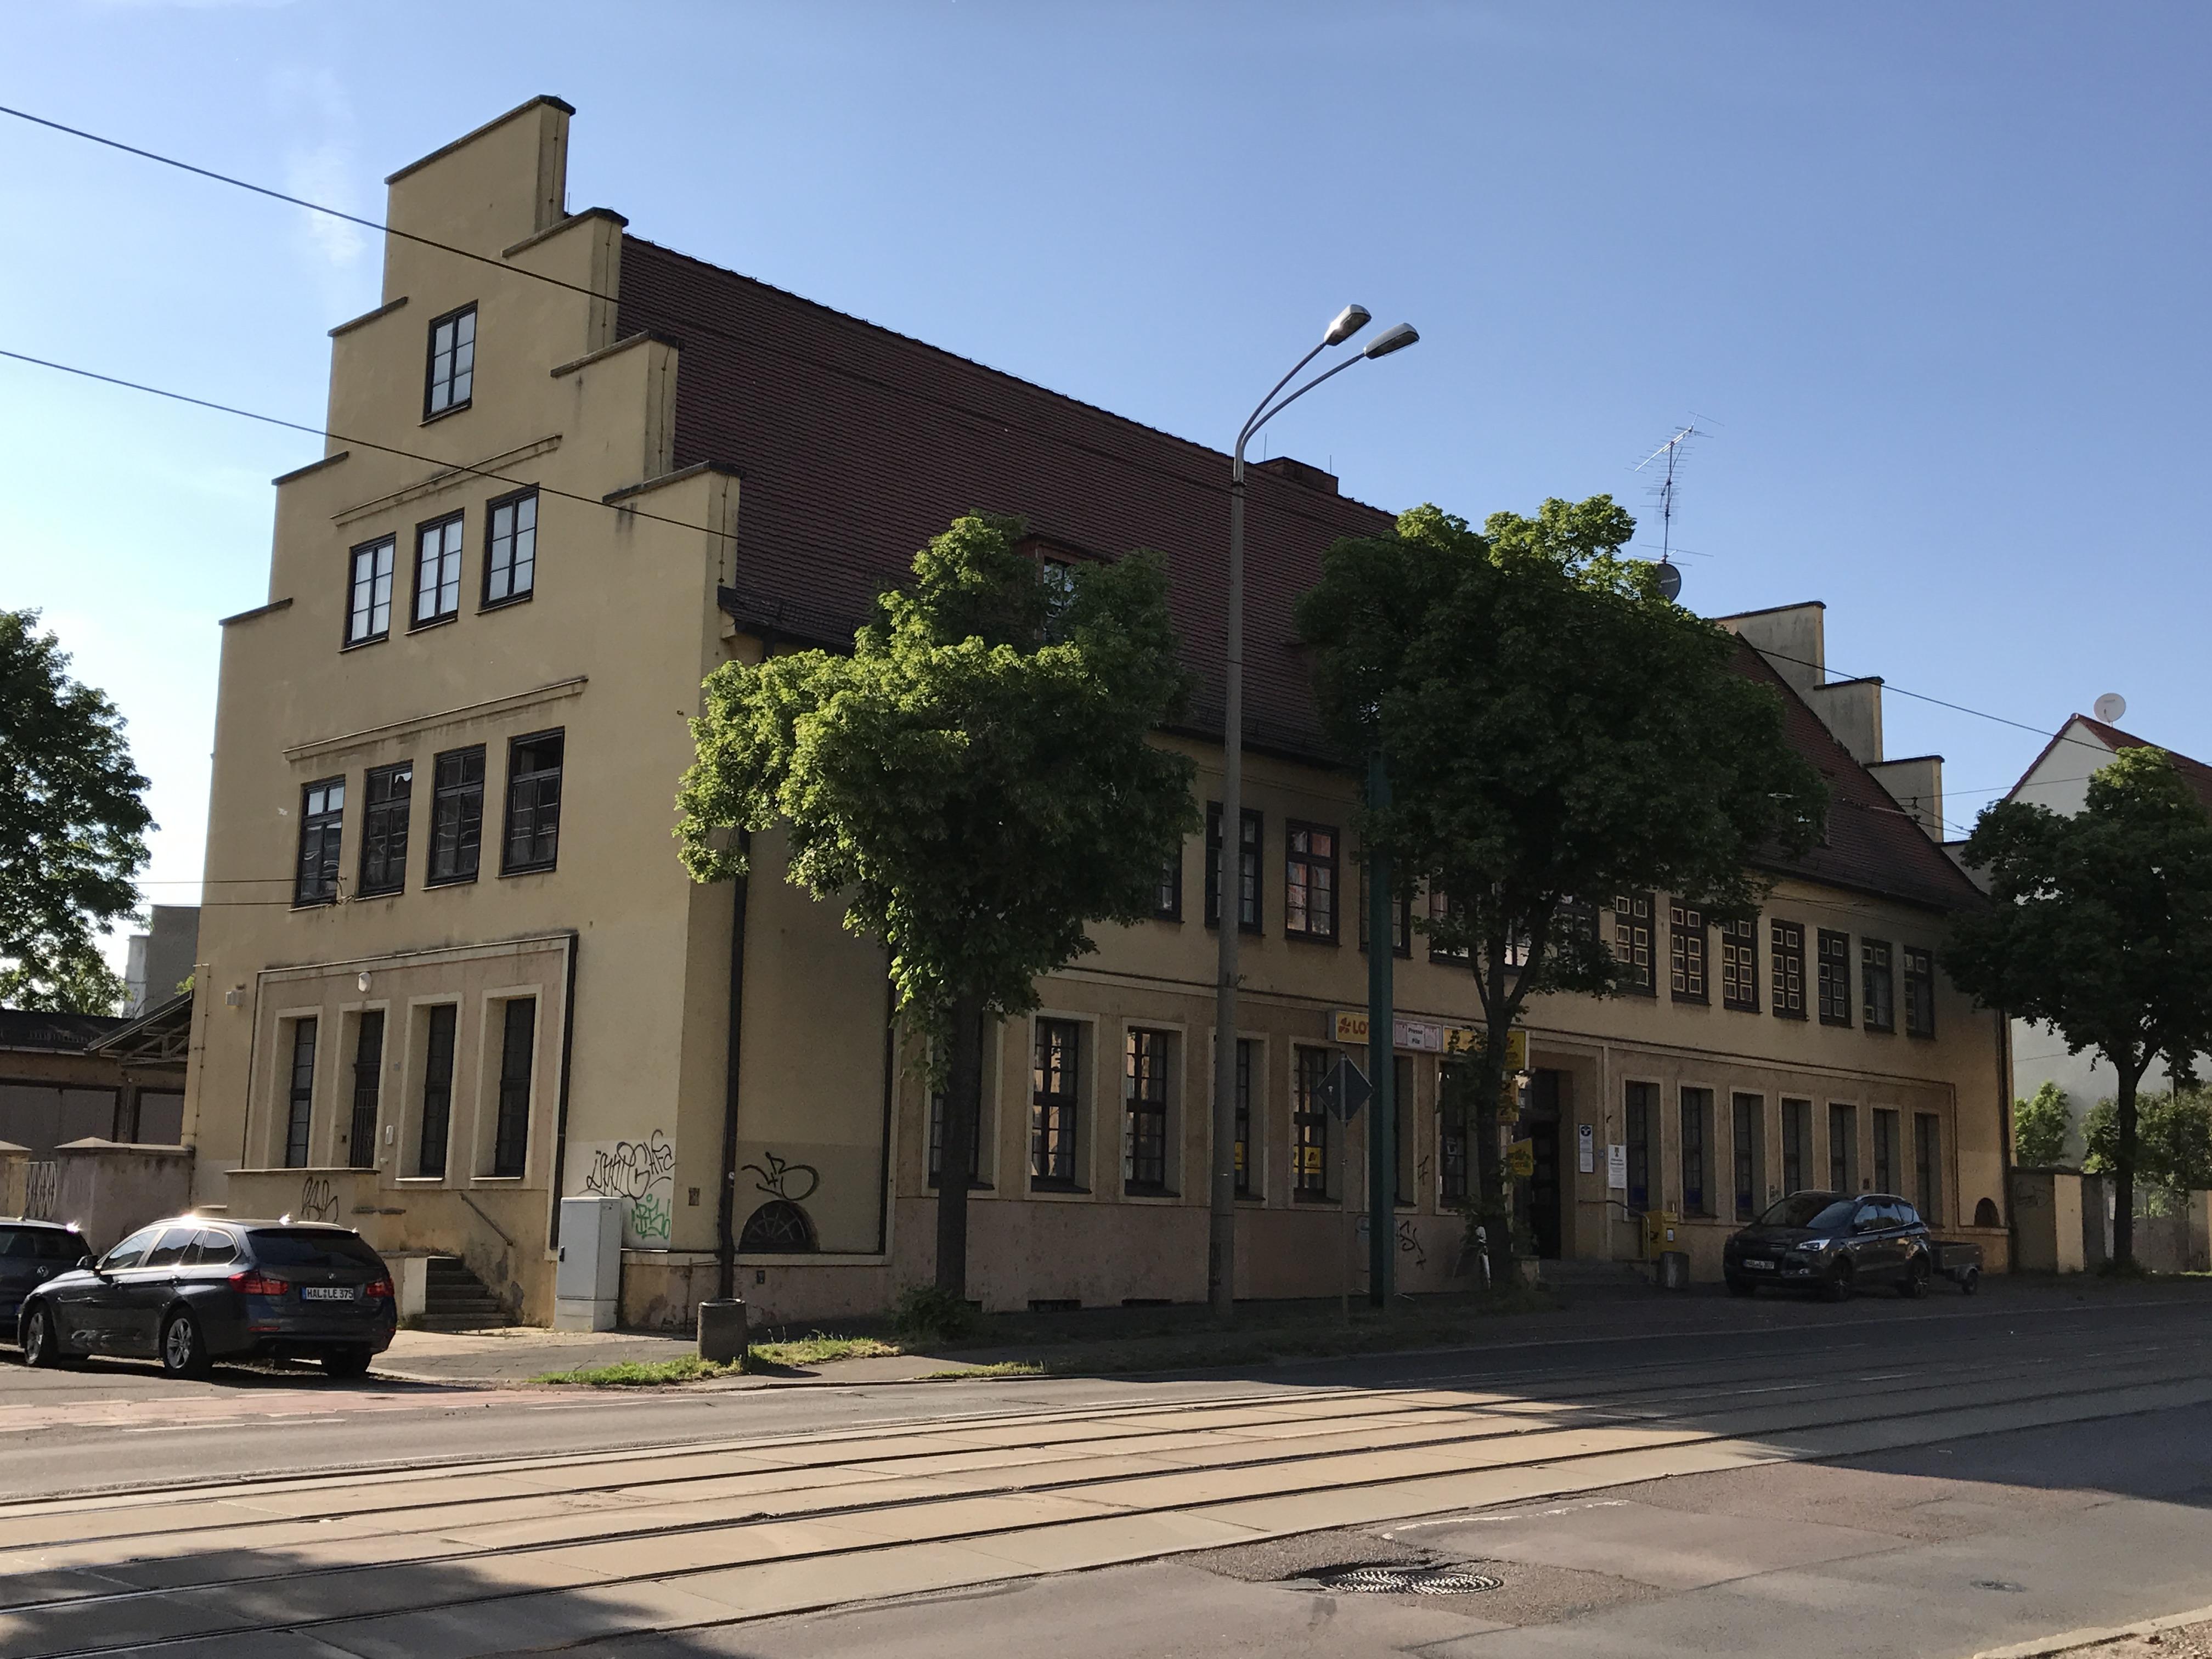 Postamt 2017